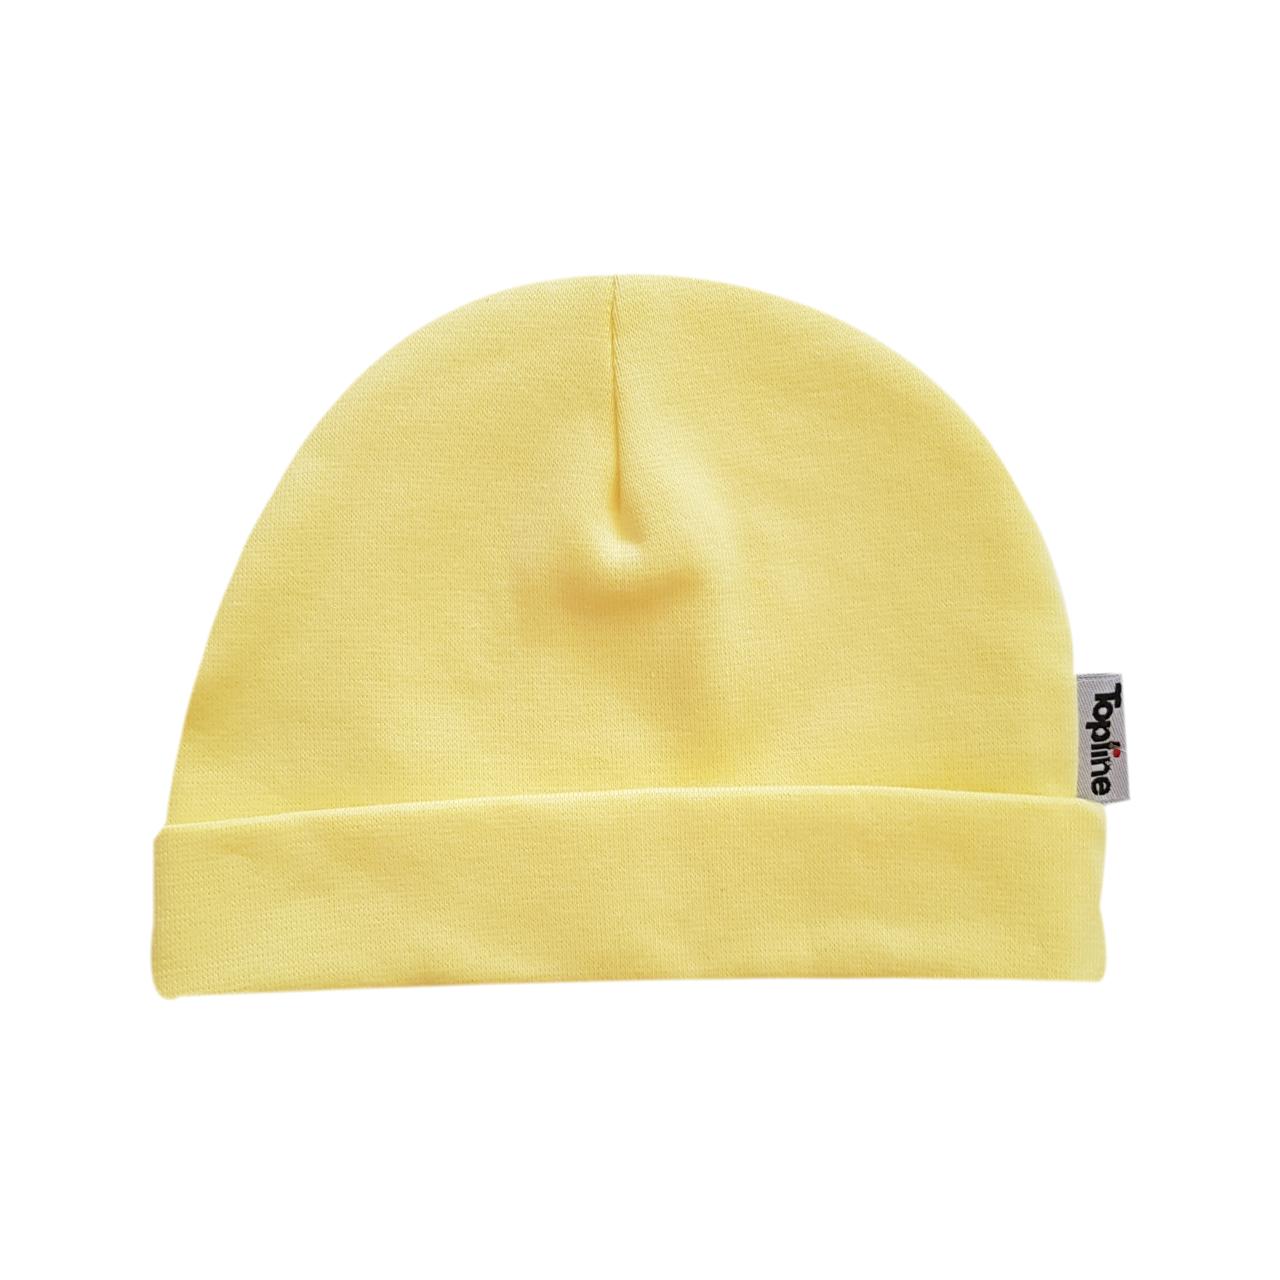 کلاه نوزادی تاپ لاین کد 5